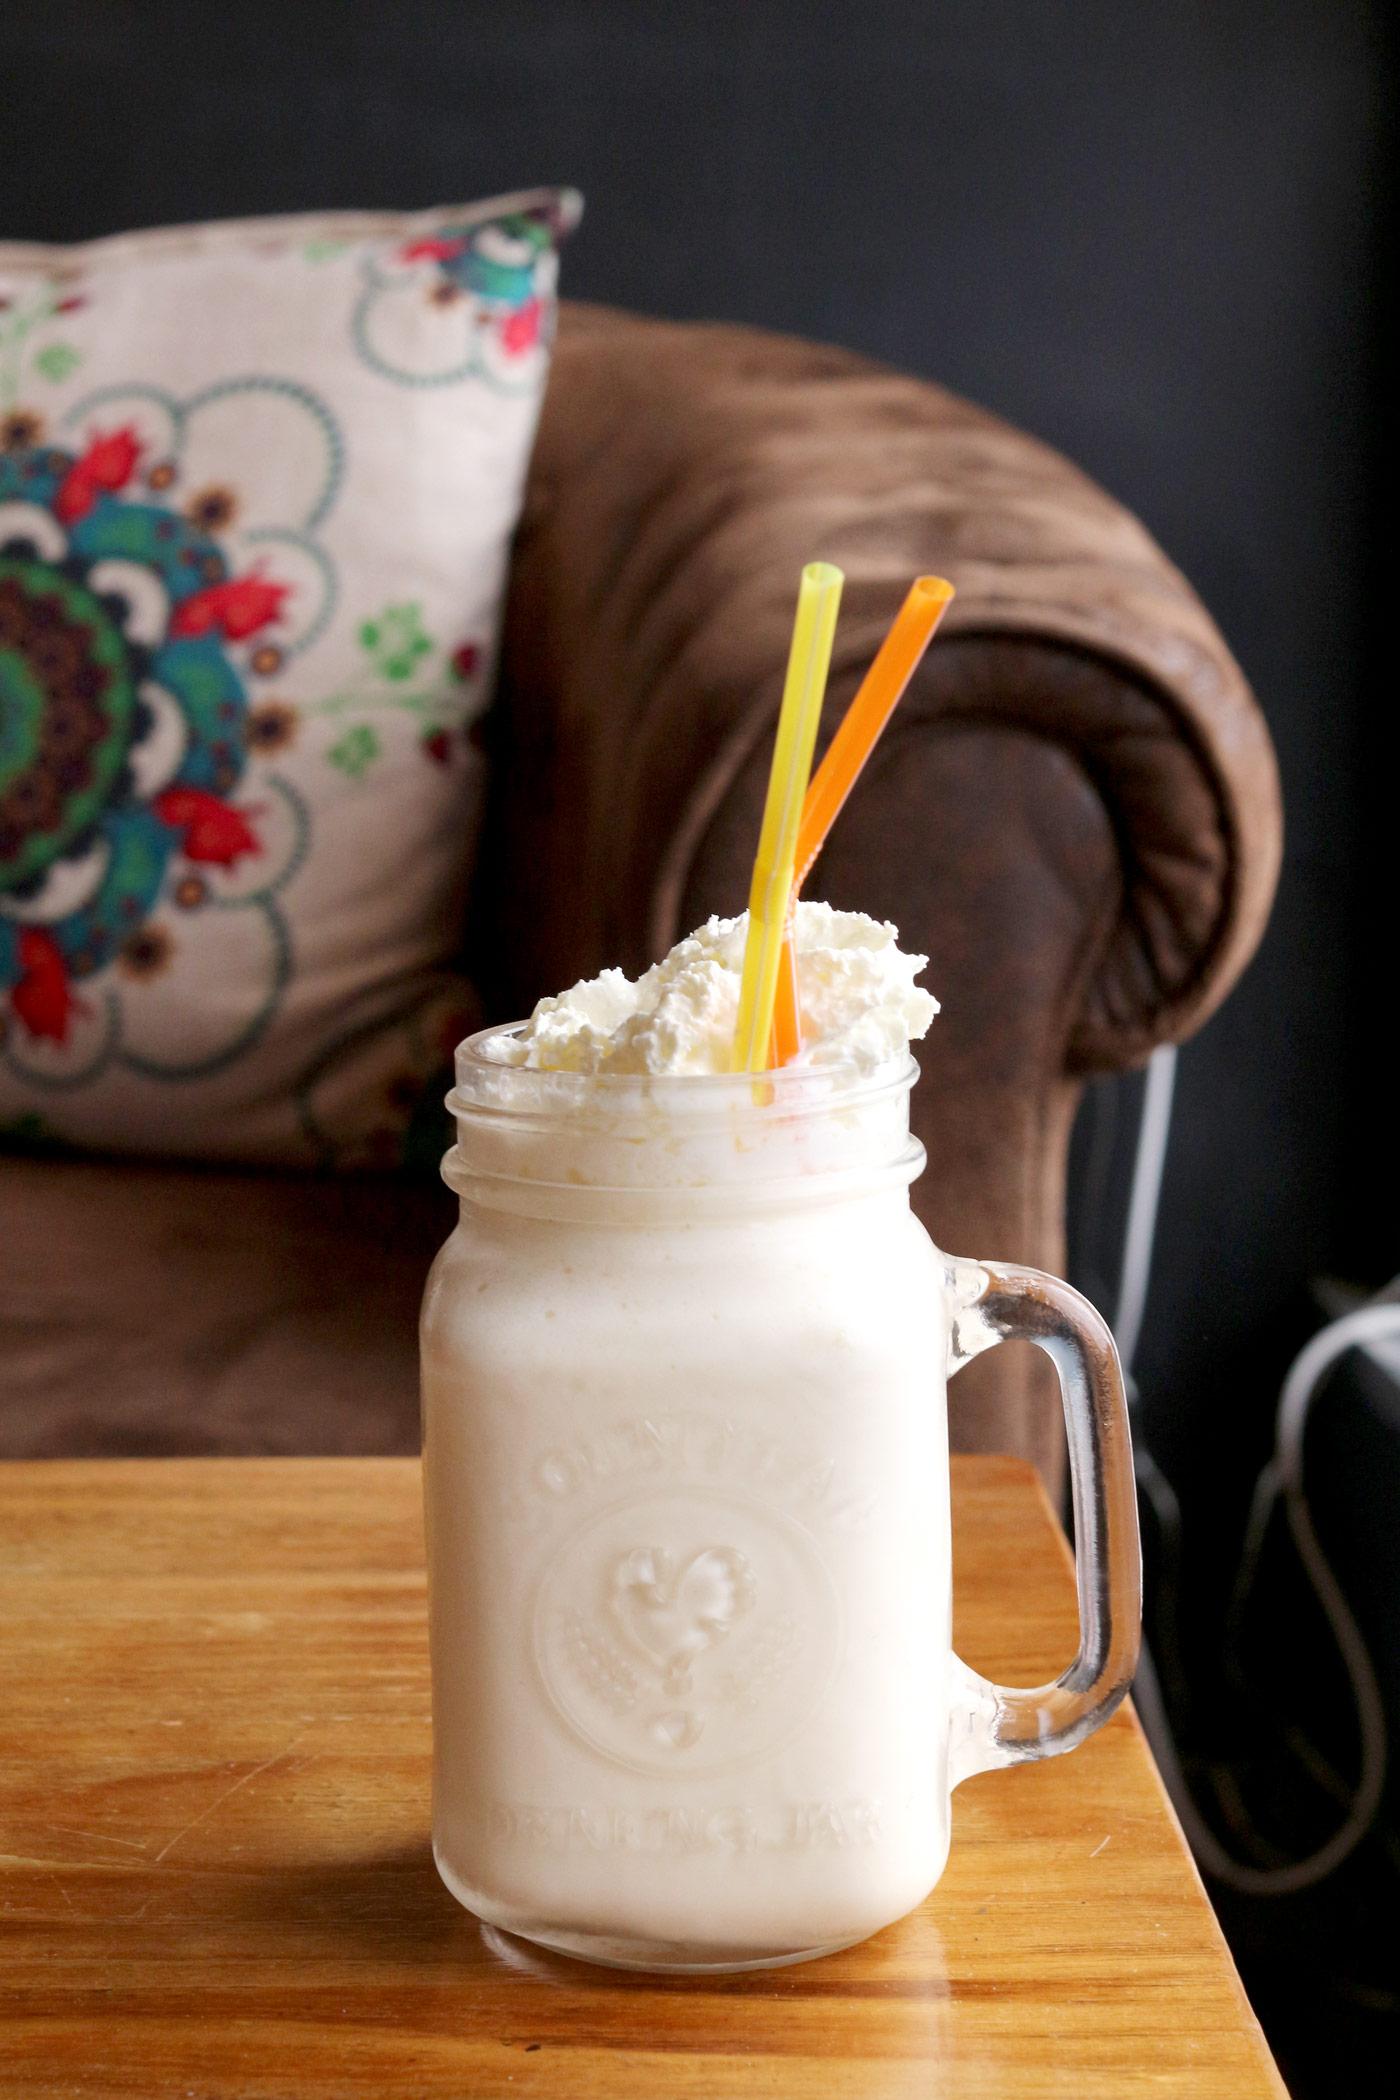 meet-and-treat-newcastle-chinatown-cafe-milkshake